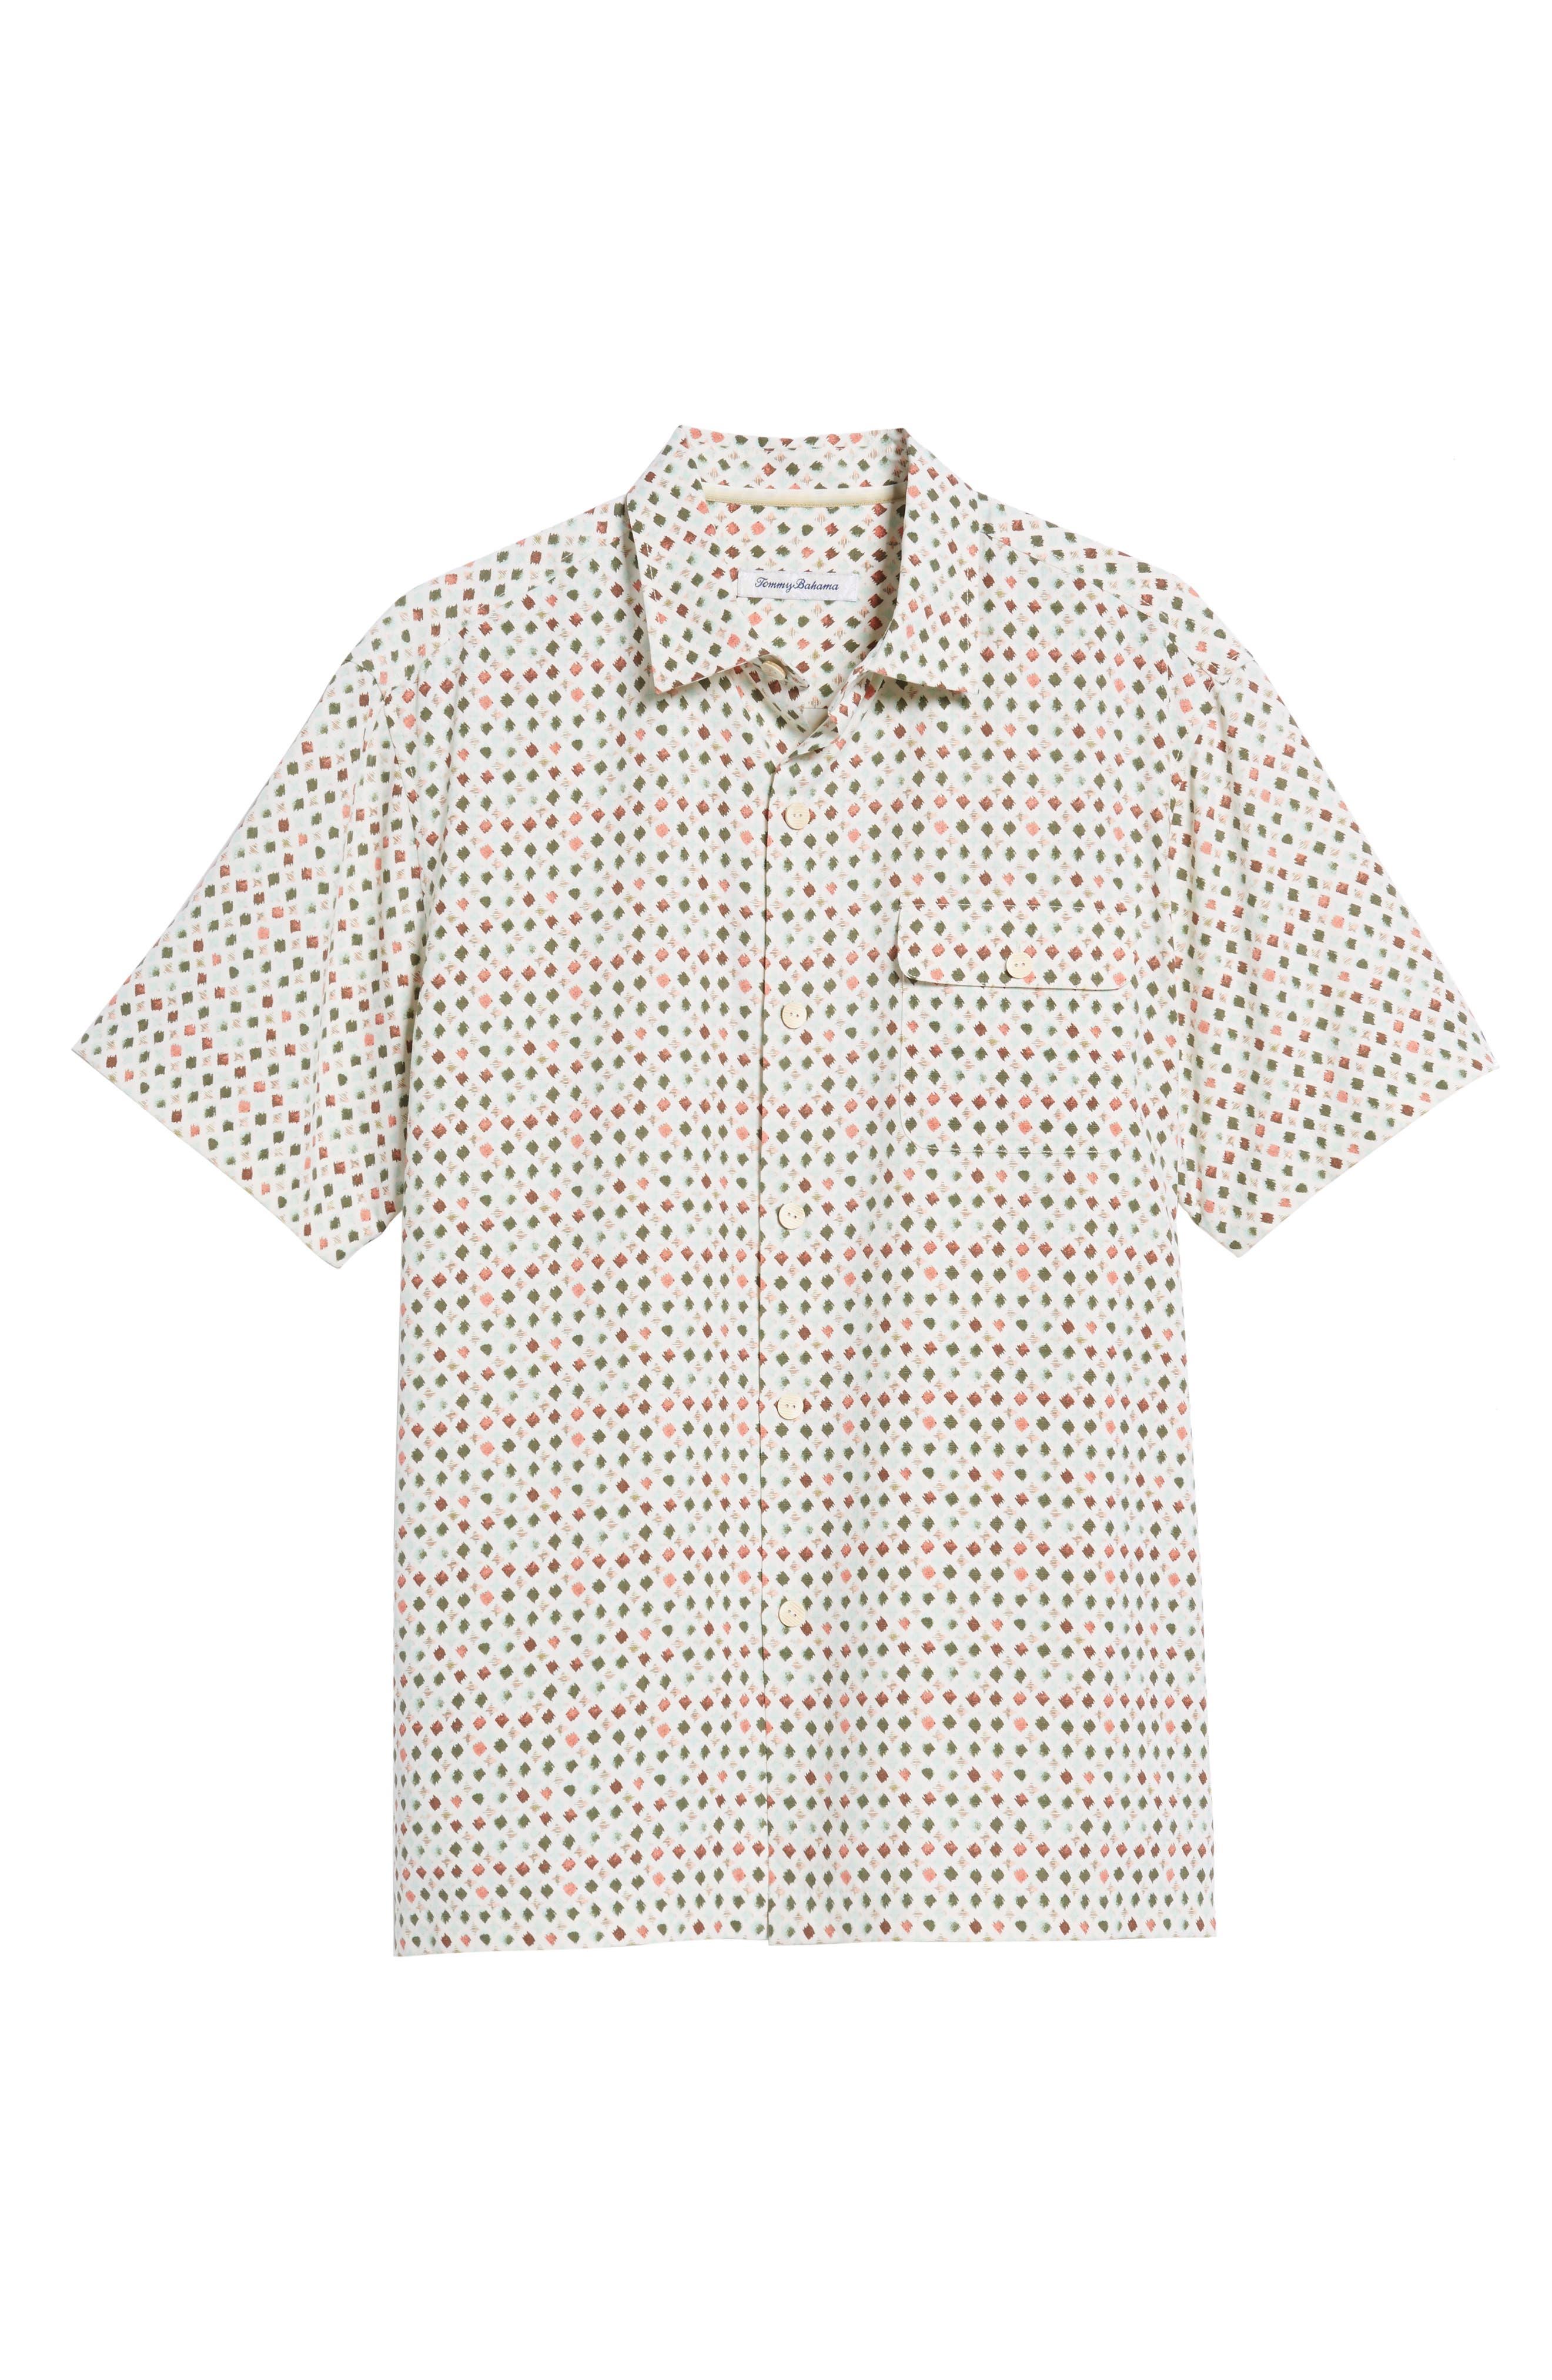 Atomic Geo Print Silk Sport Shirt,                             Alternate thumbnail 6, color,                             COCONUT CREAM